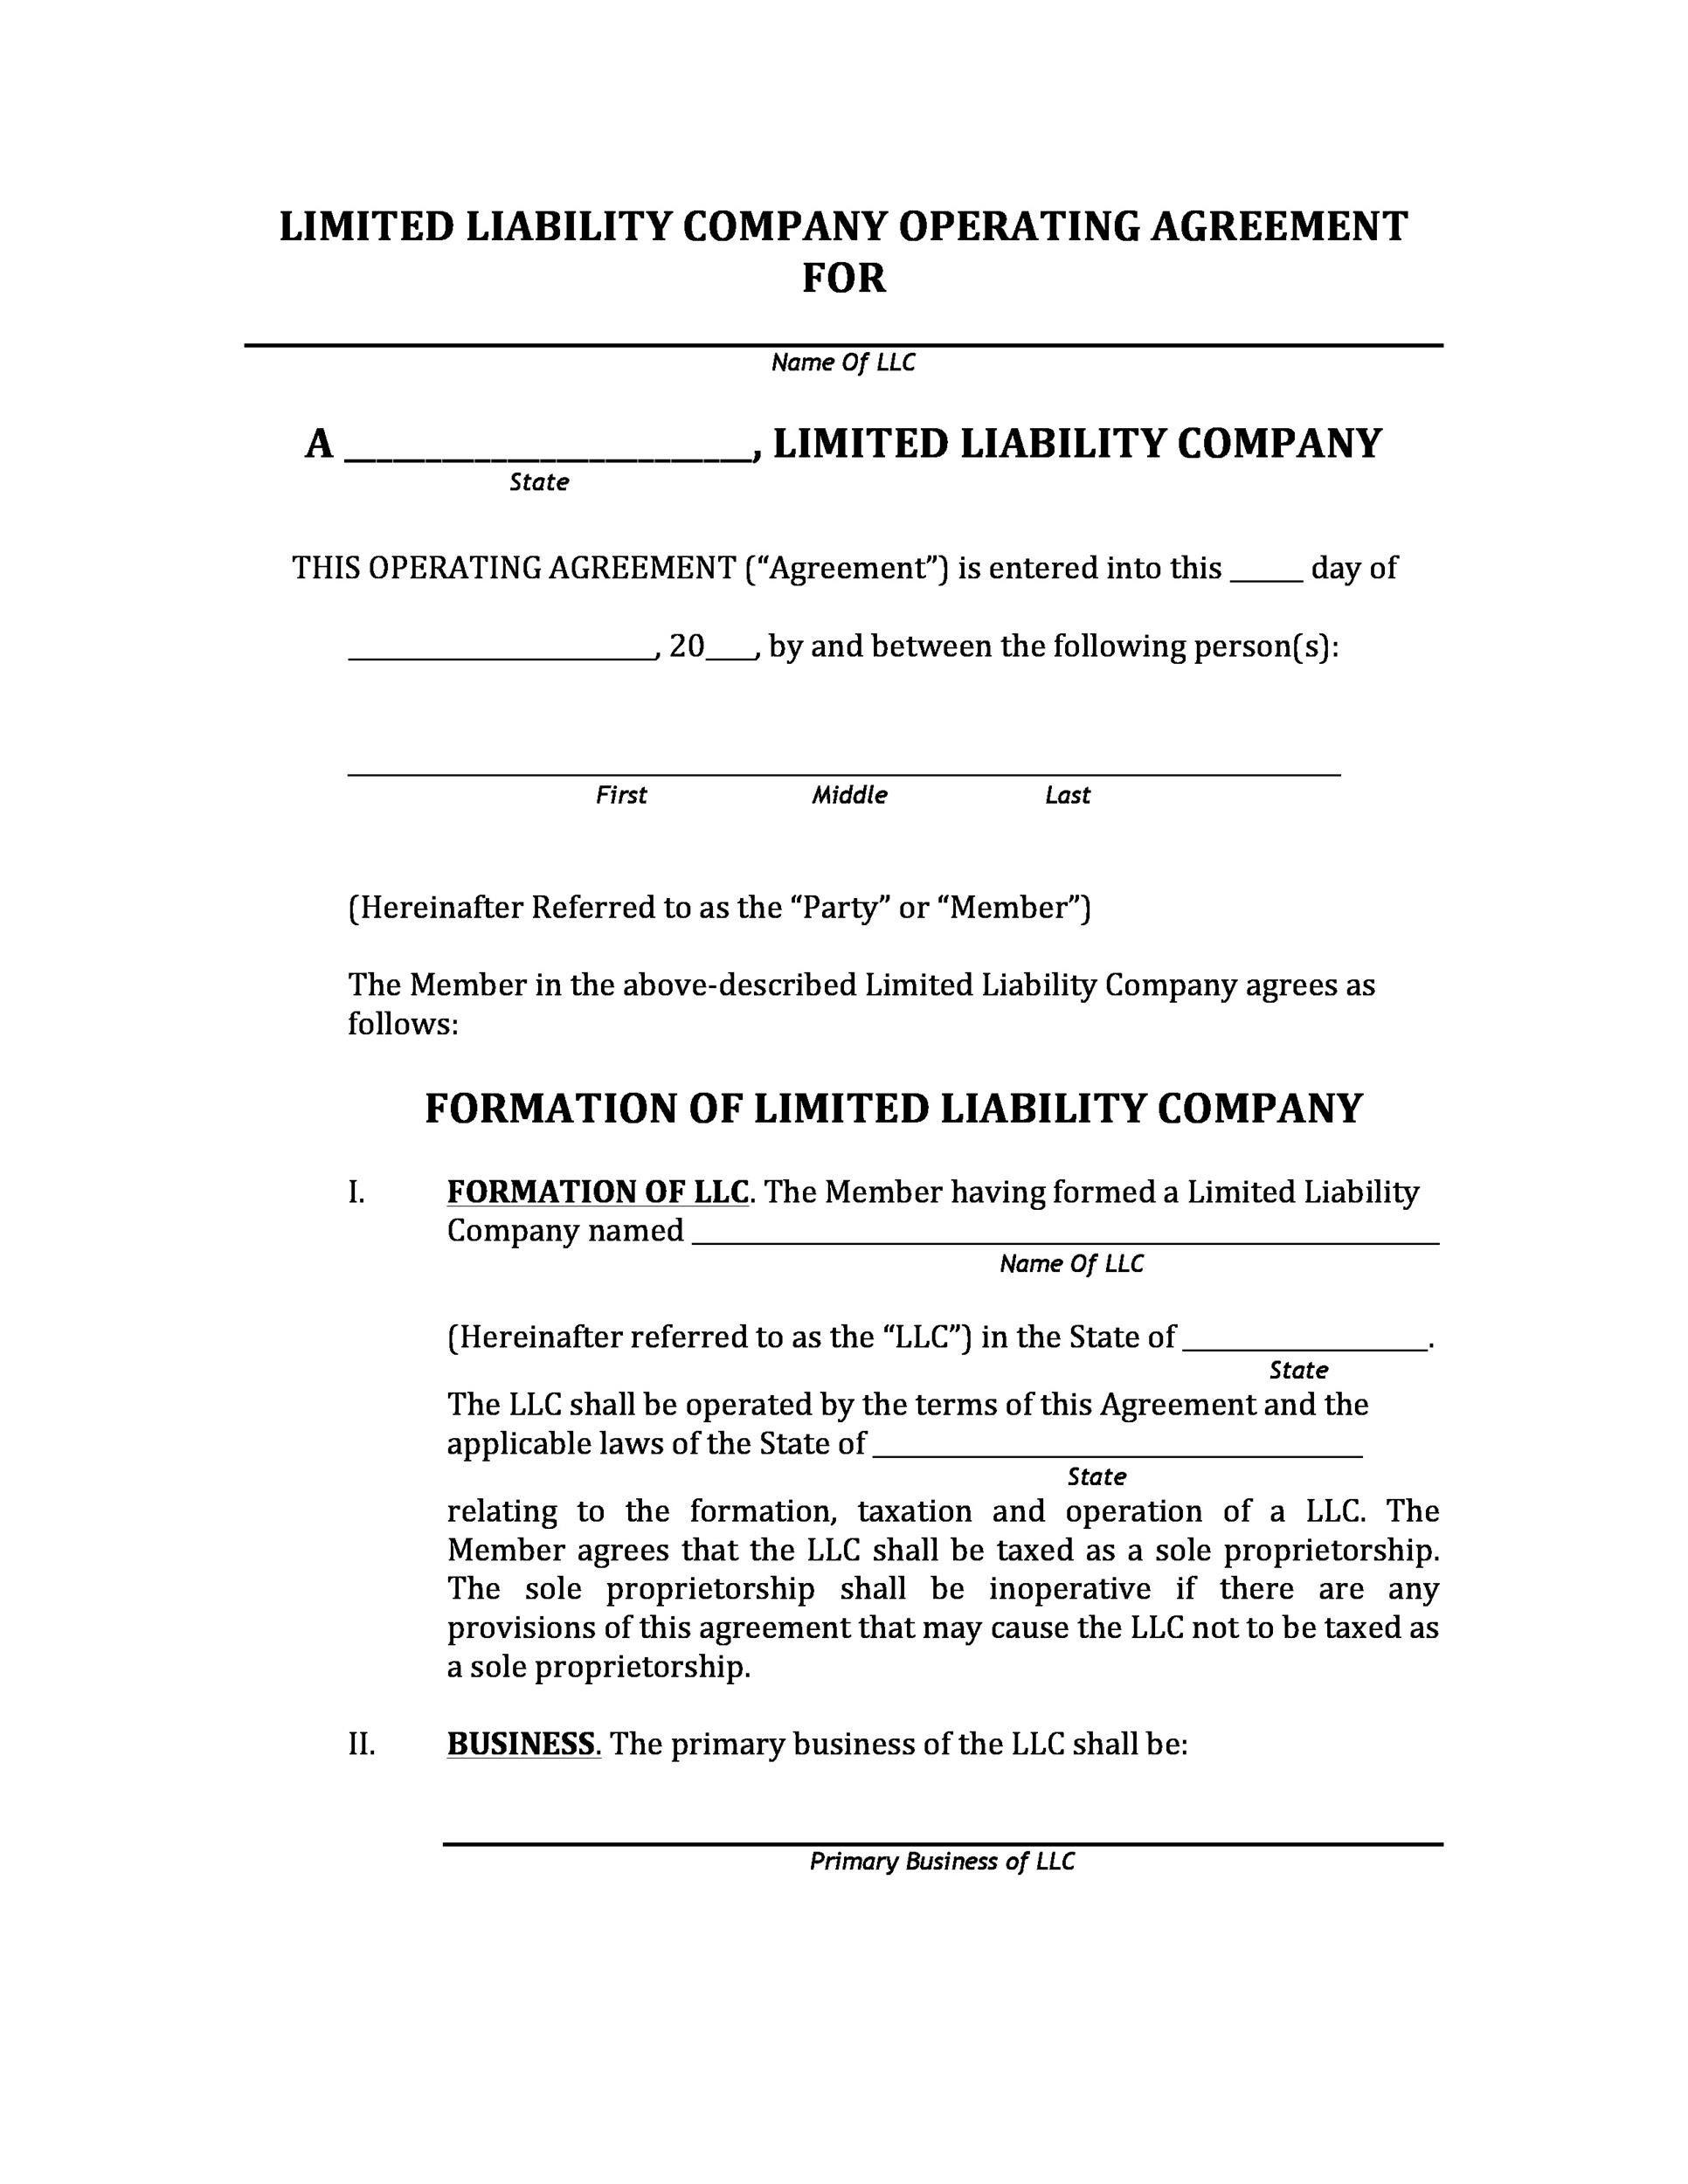 006 Marvelou Llc Partnership Agreement Template Image  Free OperatingFull